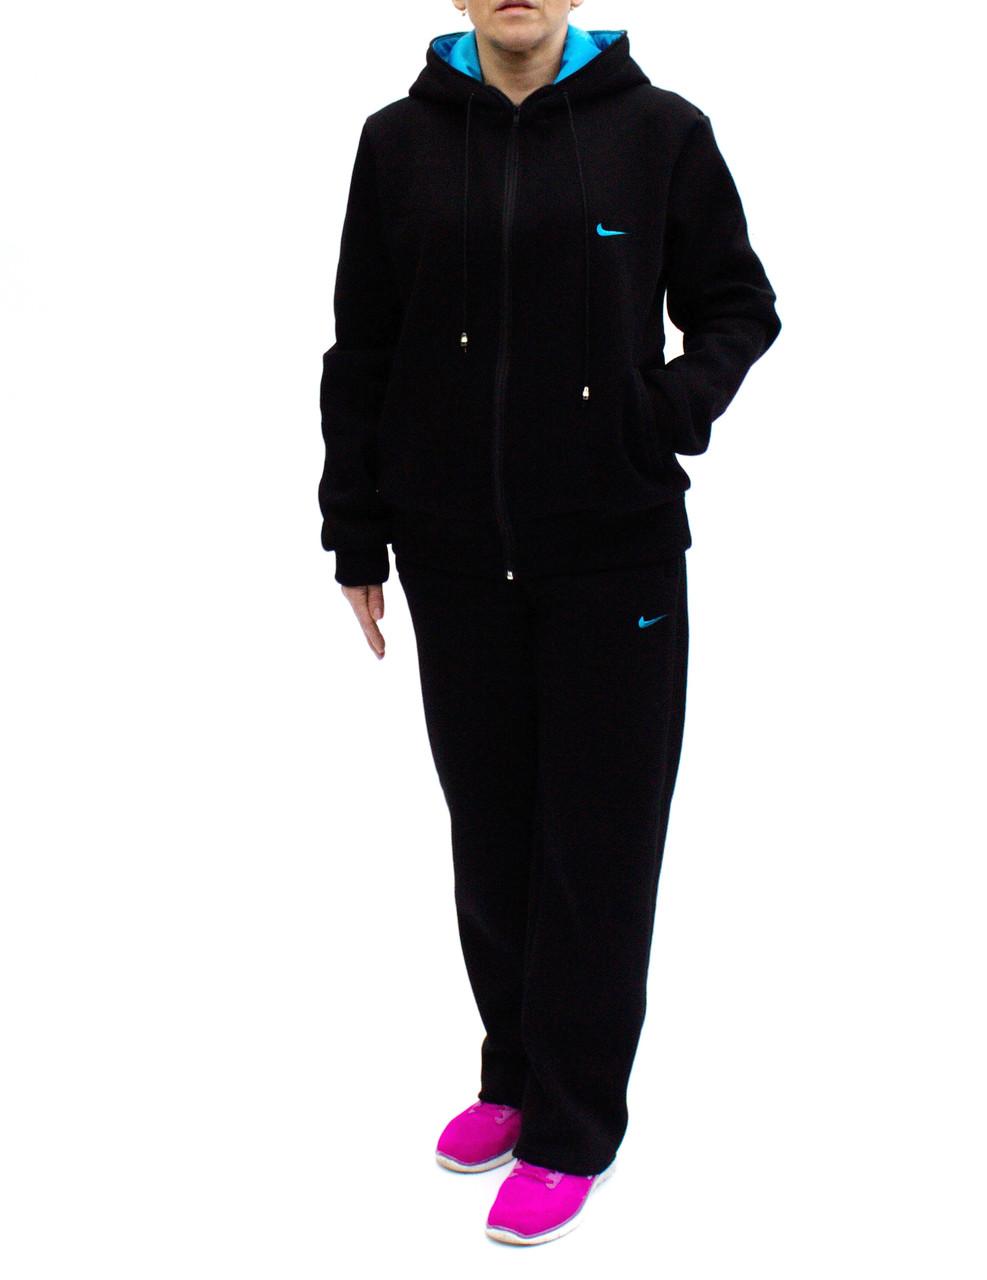 Теплый спортивный костюм зимний